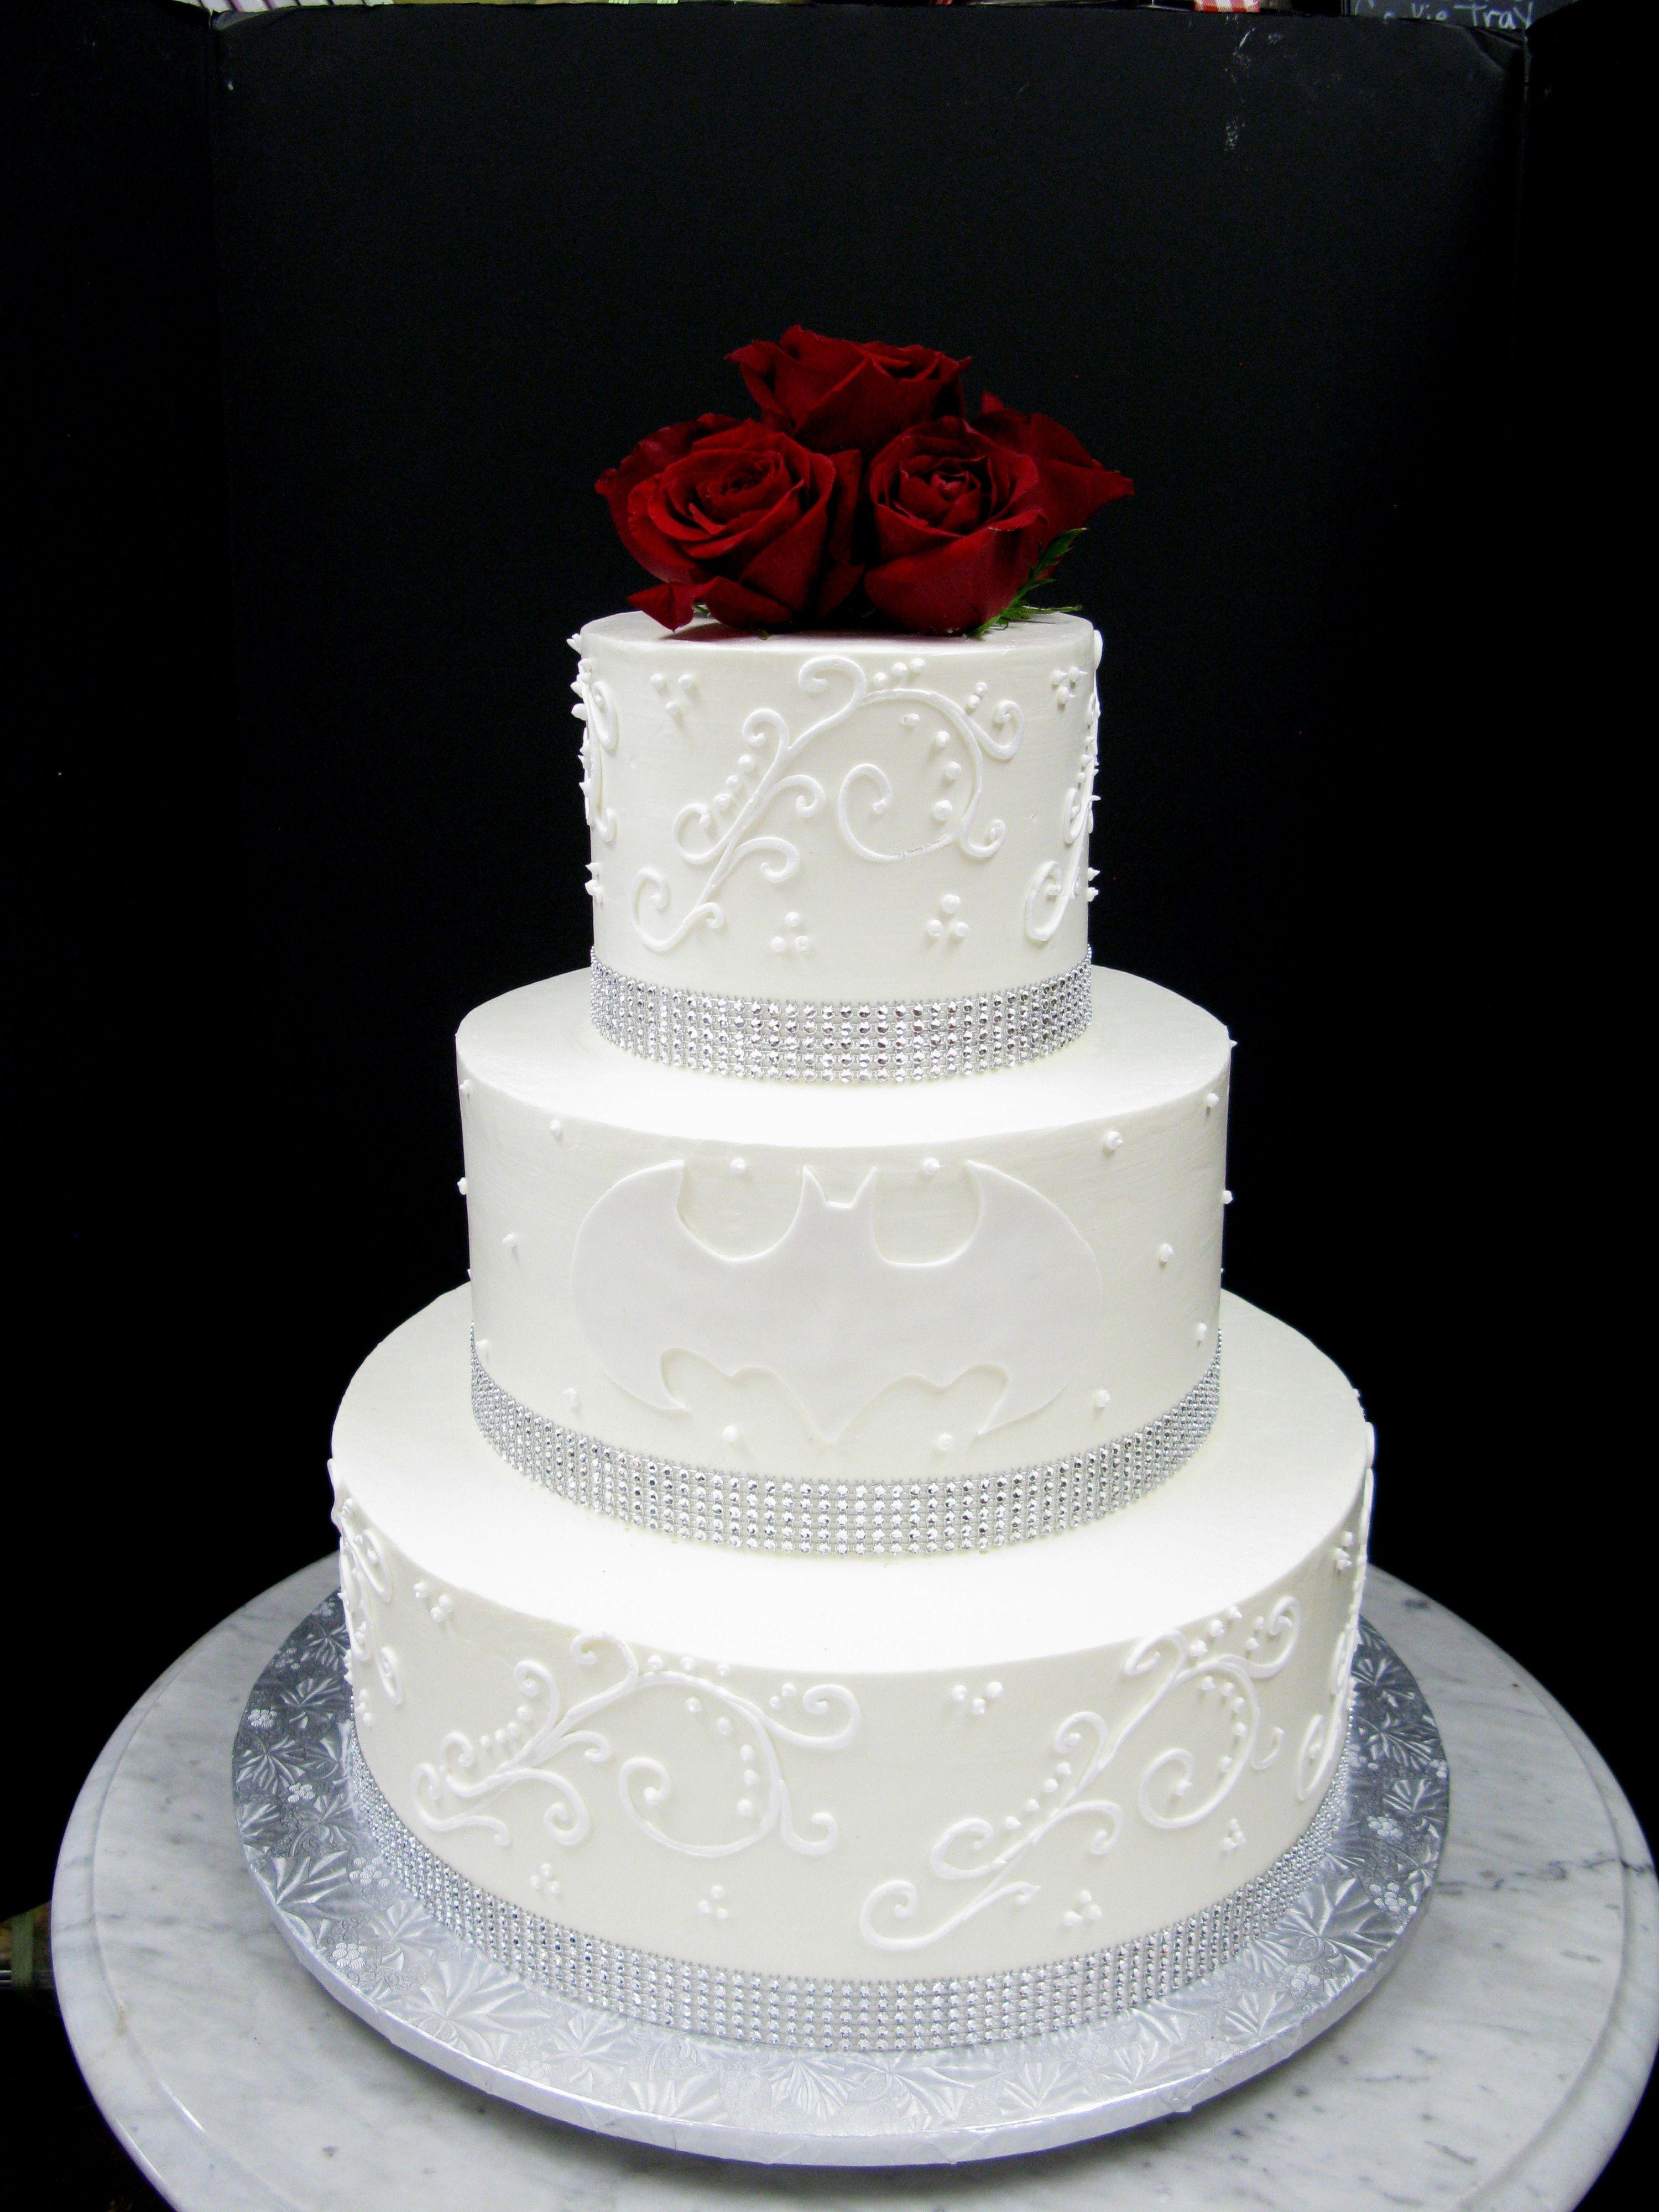 Batman Wedding Cake | Someday my Prince will come. | Pinterest ...